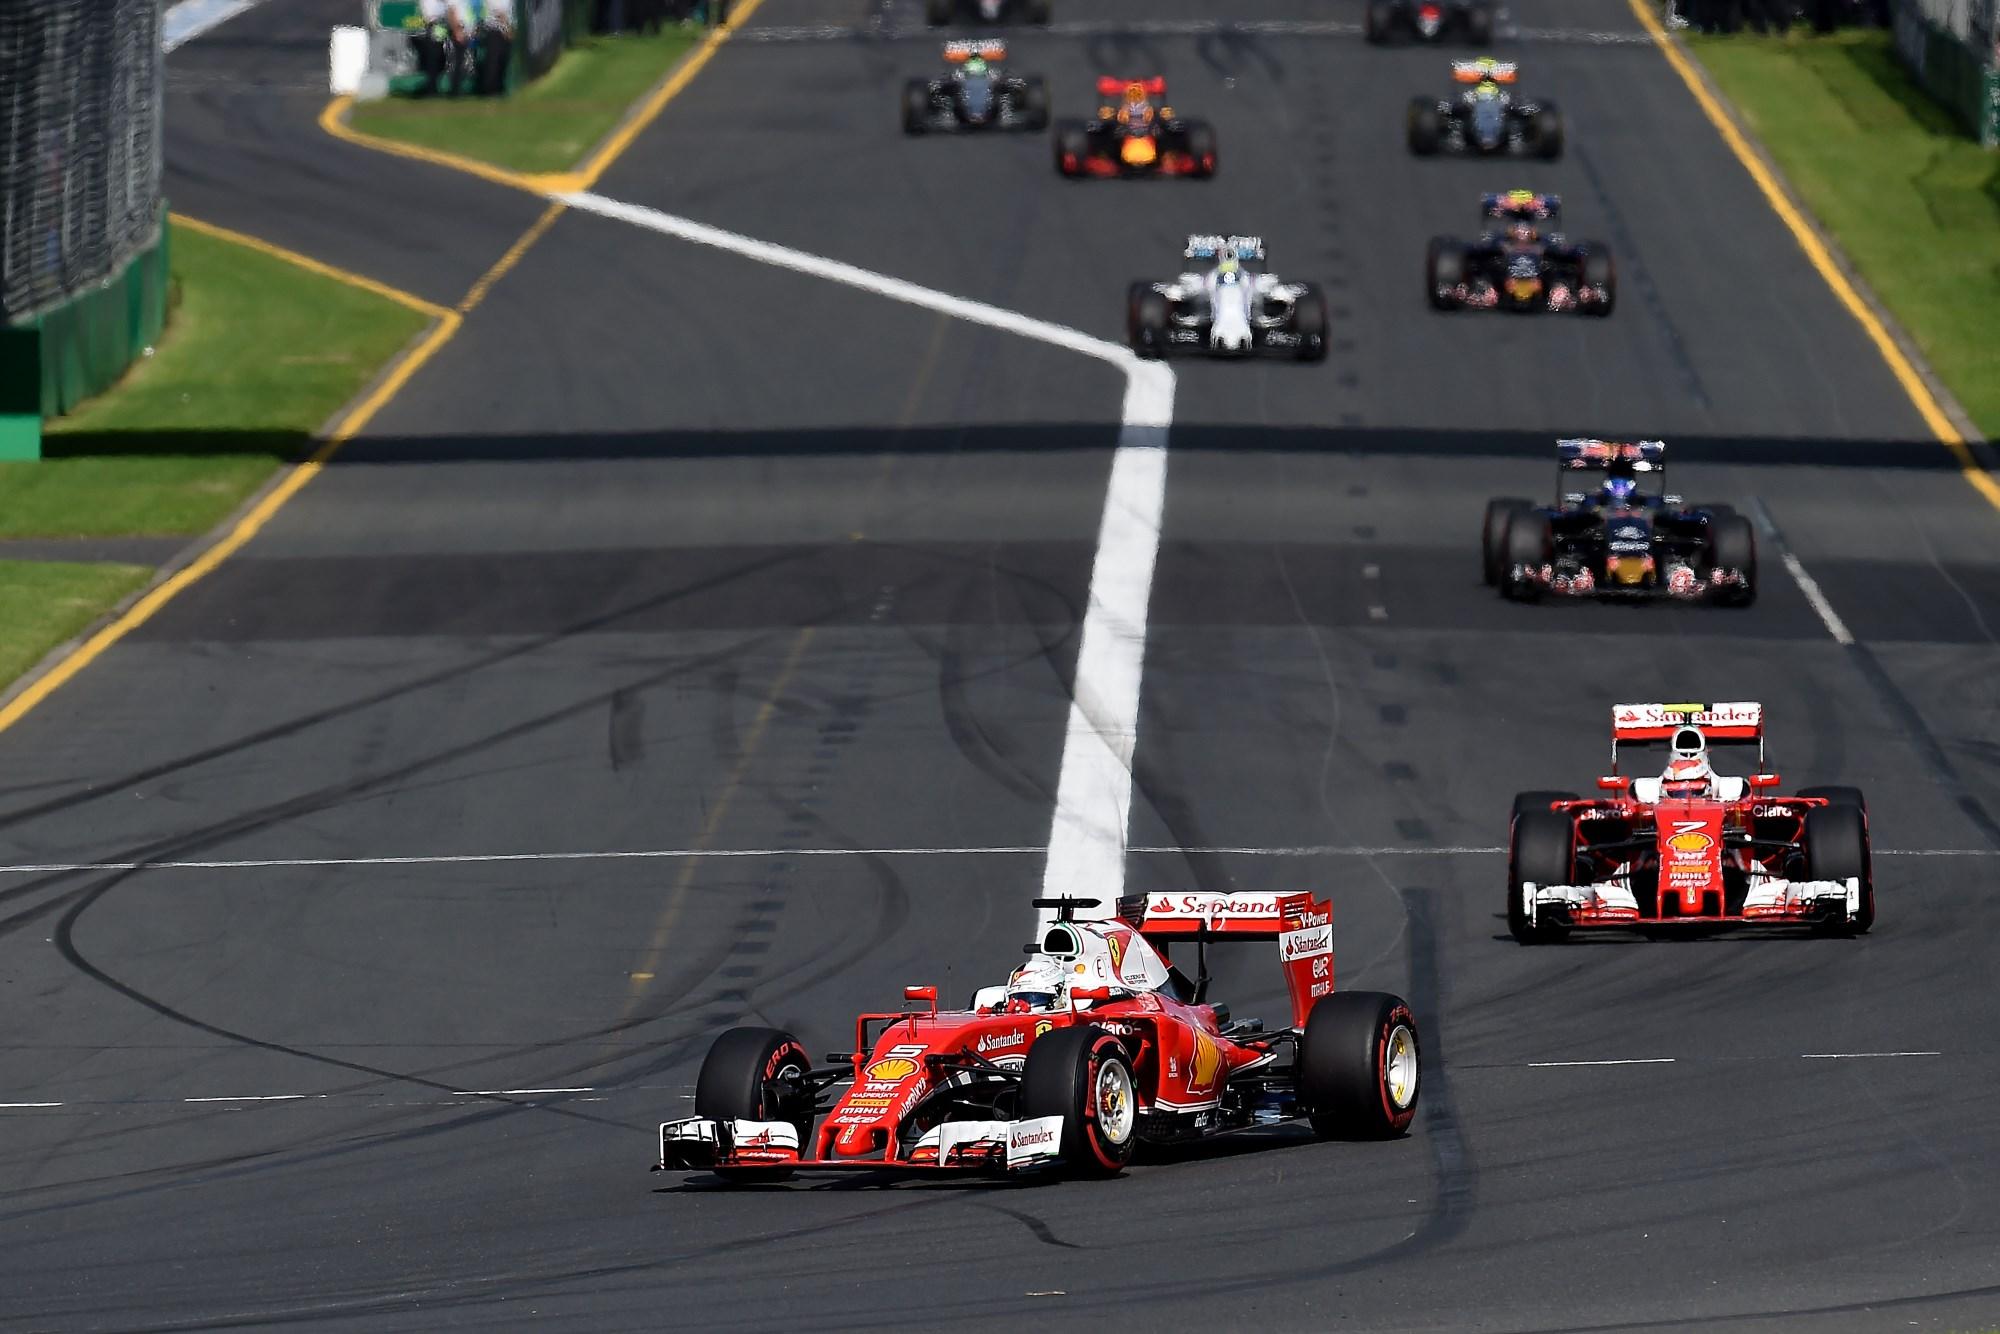 Ferrari drivers Sebastian Vettel and Kimi Raikkonen leading Australian GP 2016